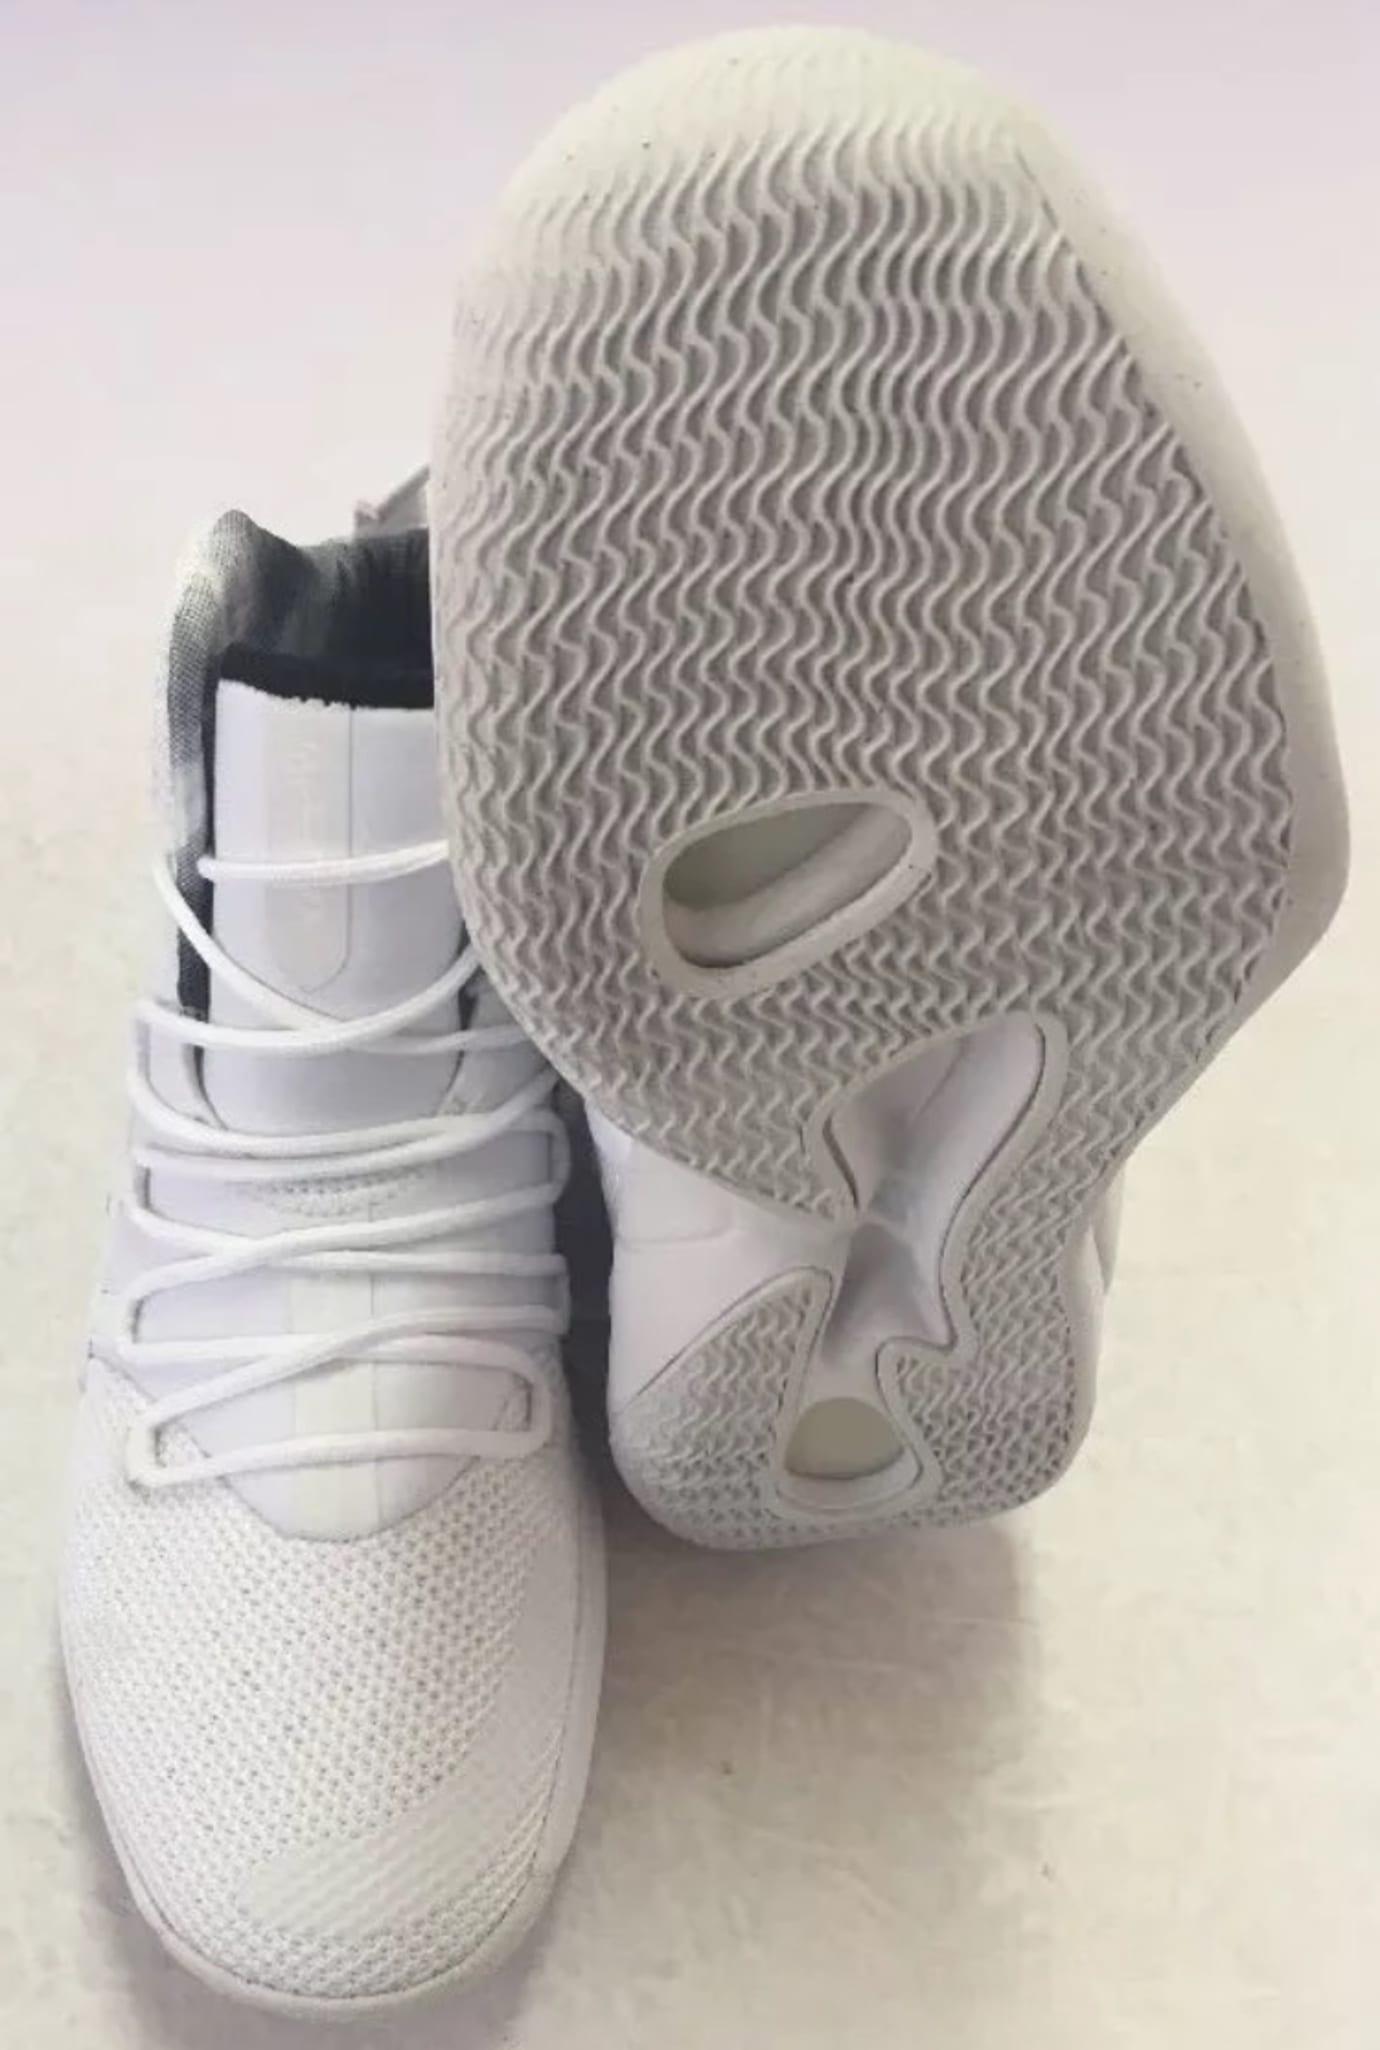 Nike Hyperdunk 2018 TB White/Black AR0467-100 Left Sole